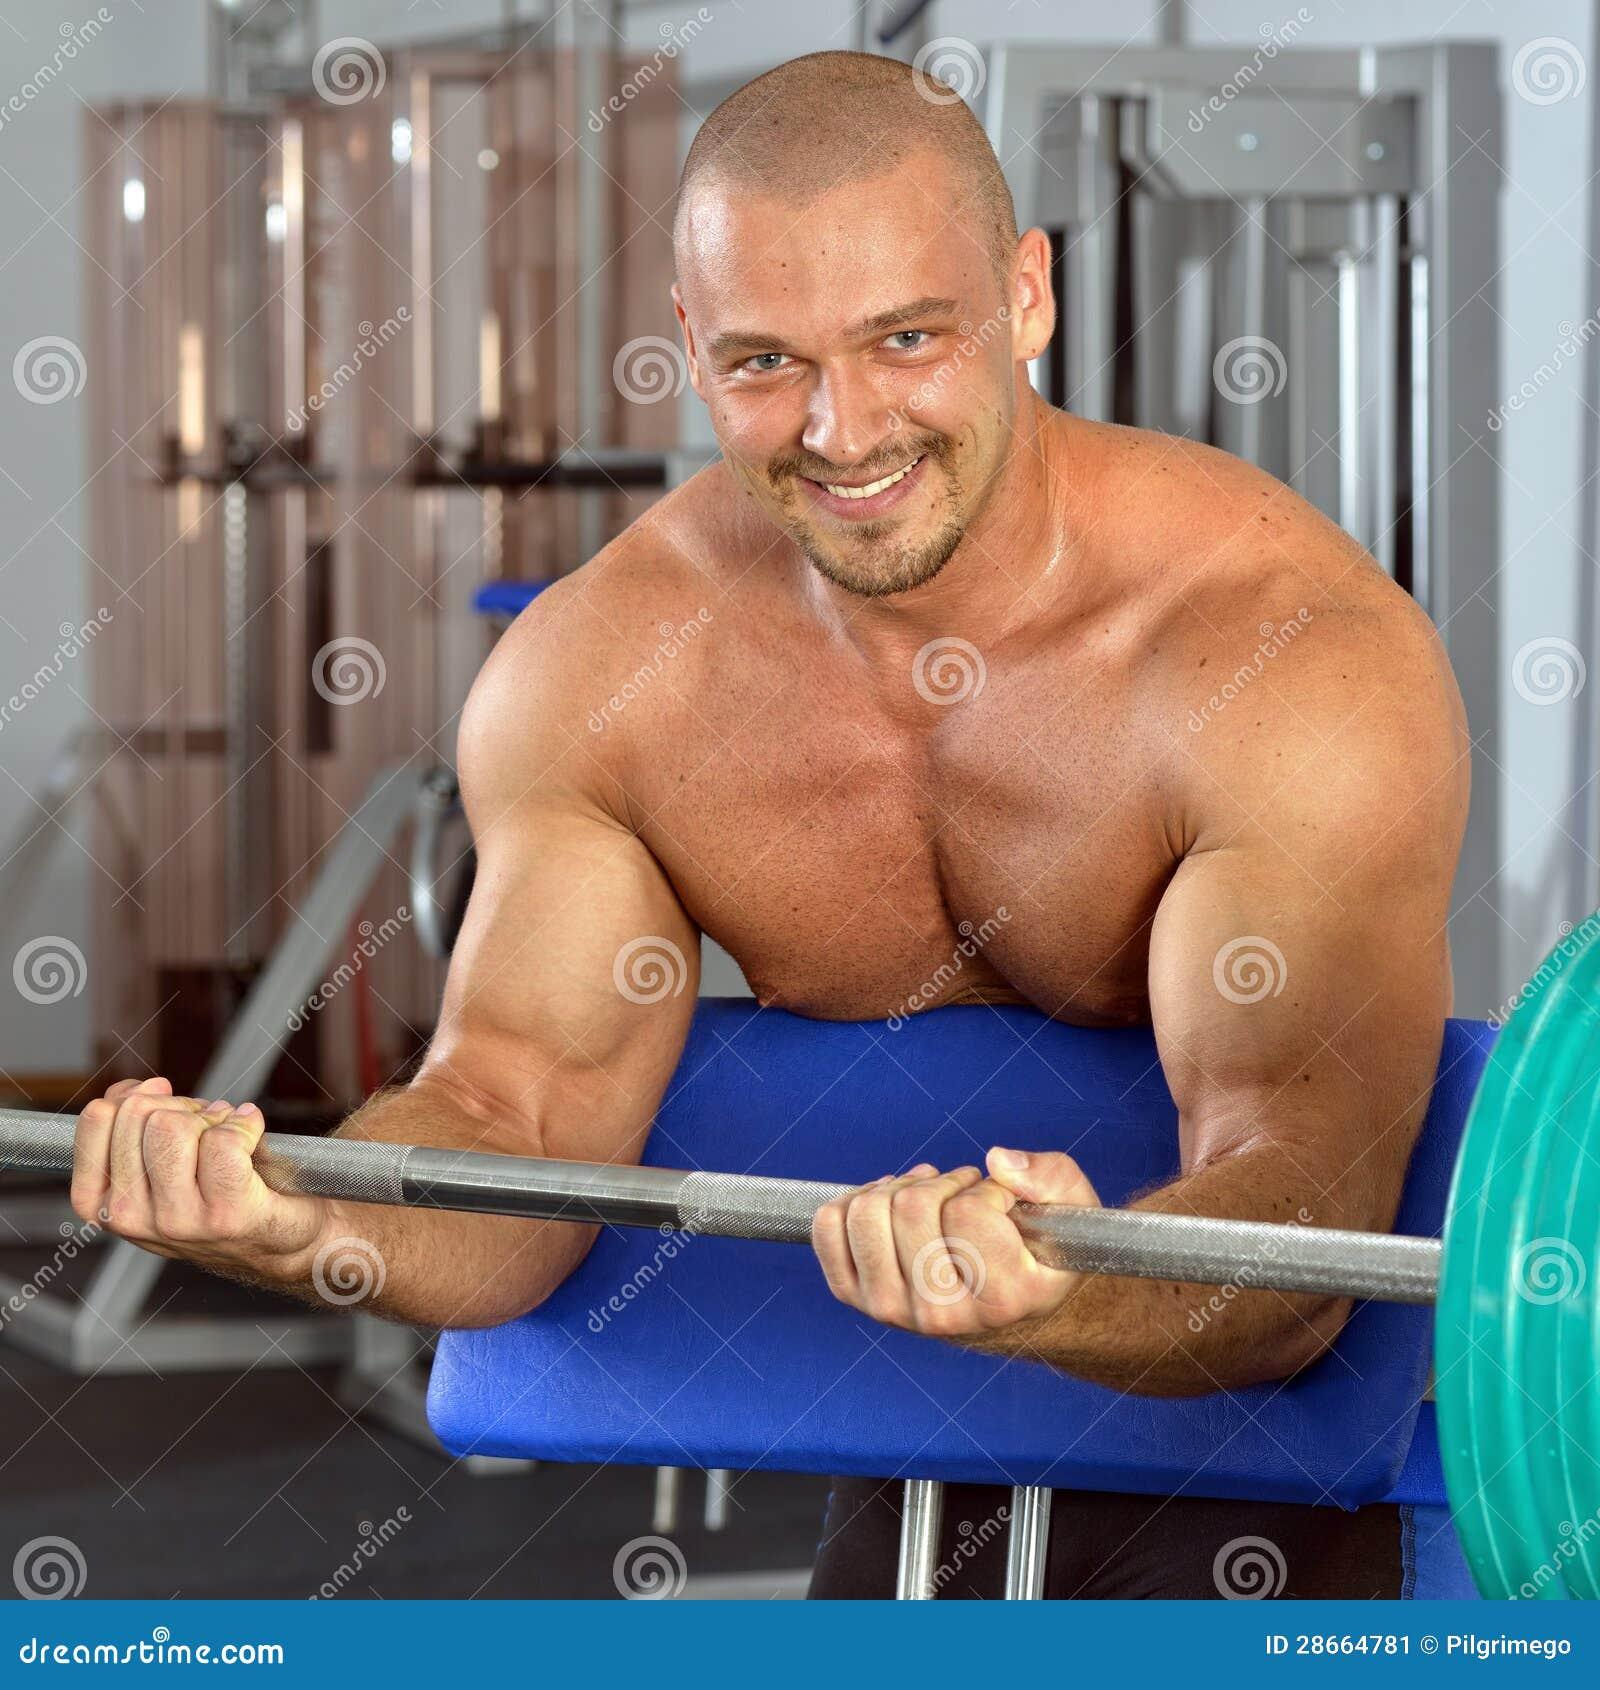 Naked Exercising Videos 89